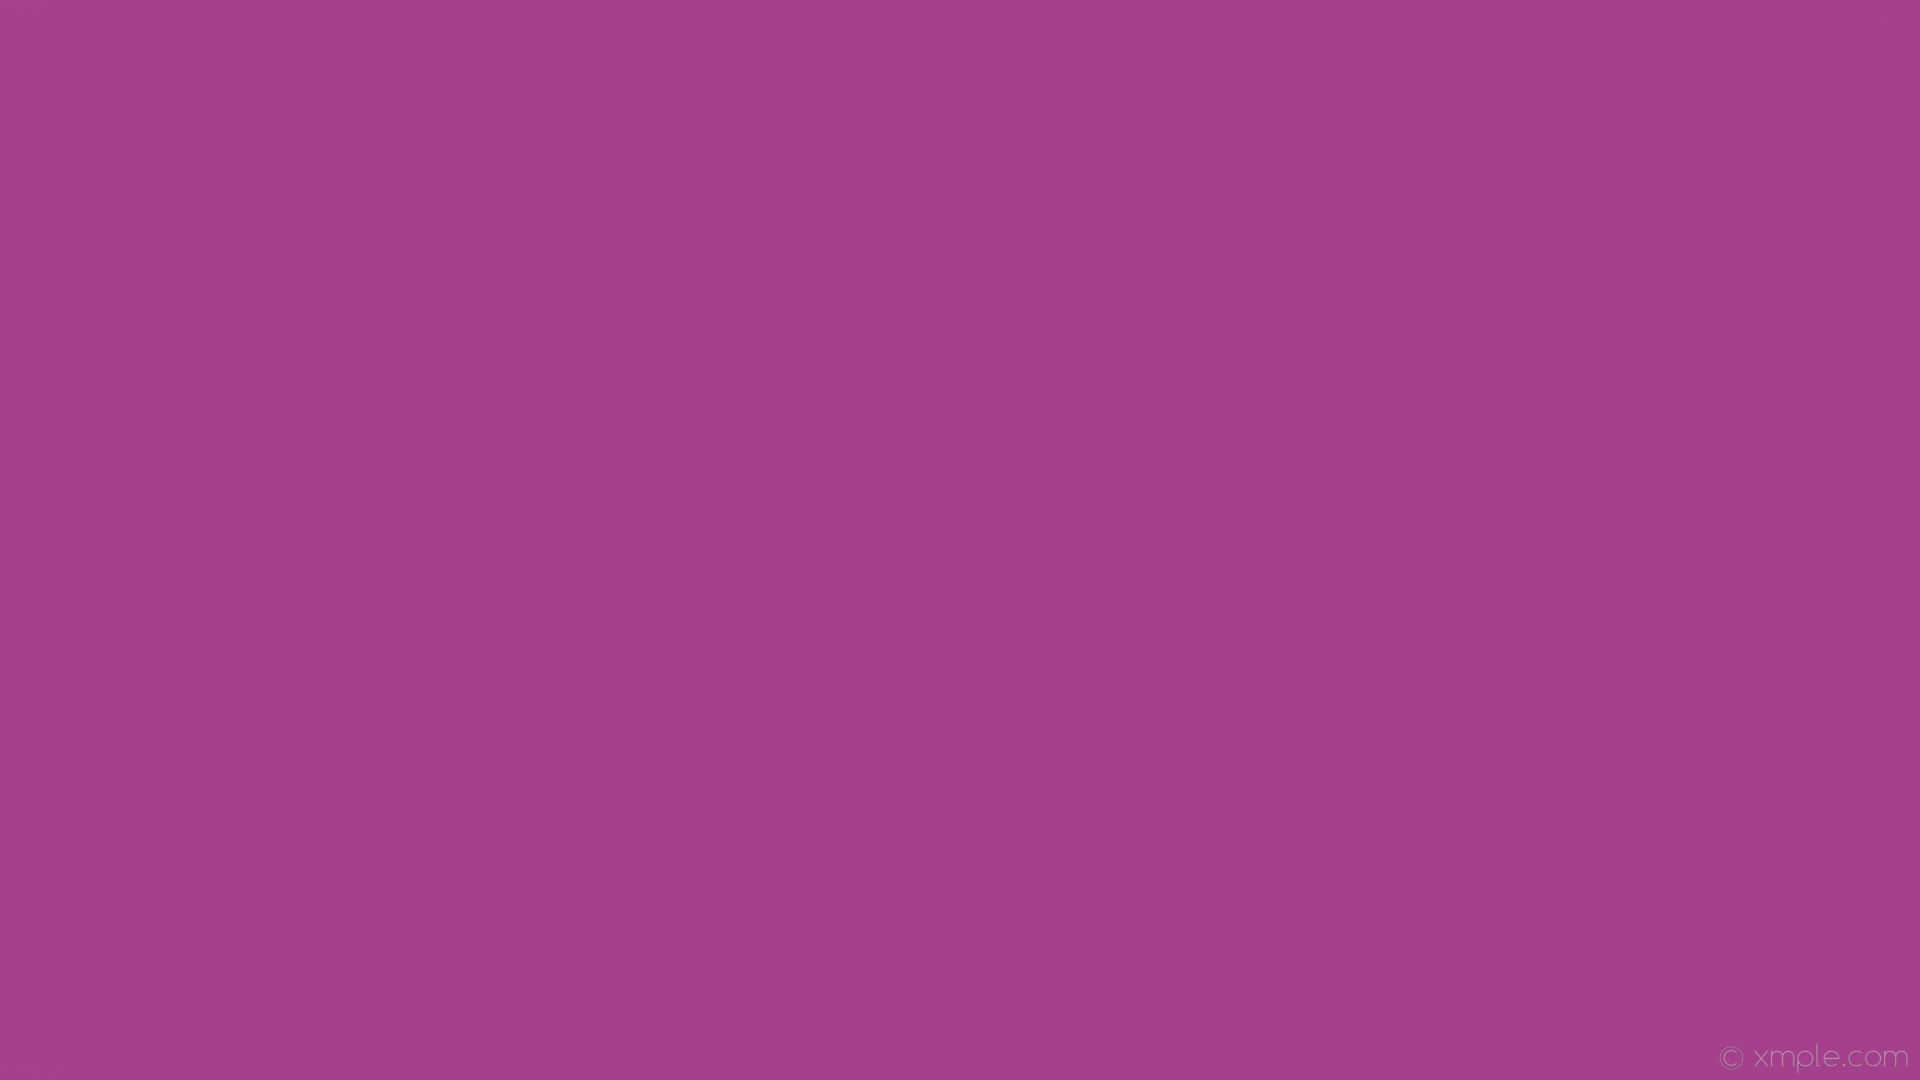 wallpaper plain solid color single one colour magenta #a5408c